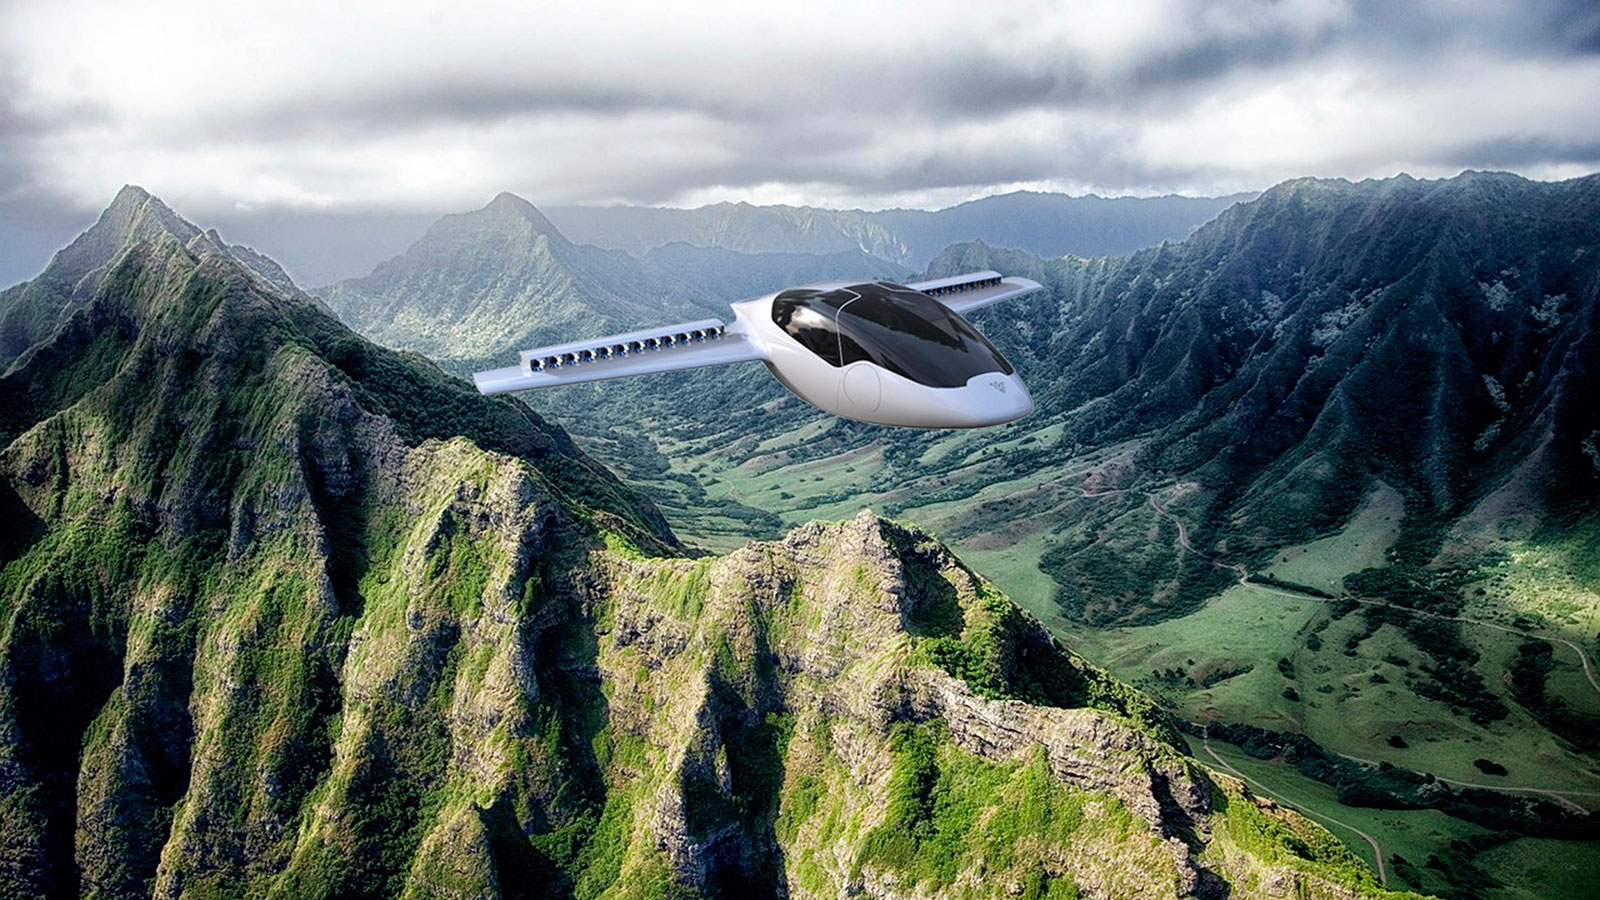 Lilium-Personal-Electric-Jet-2